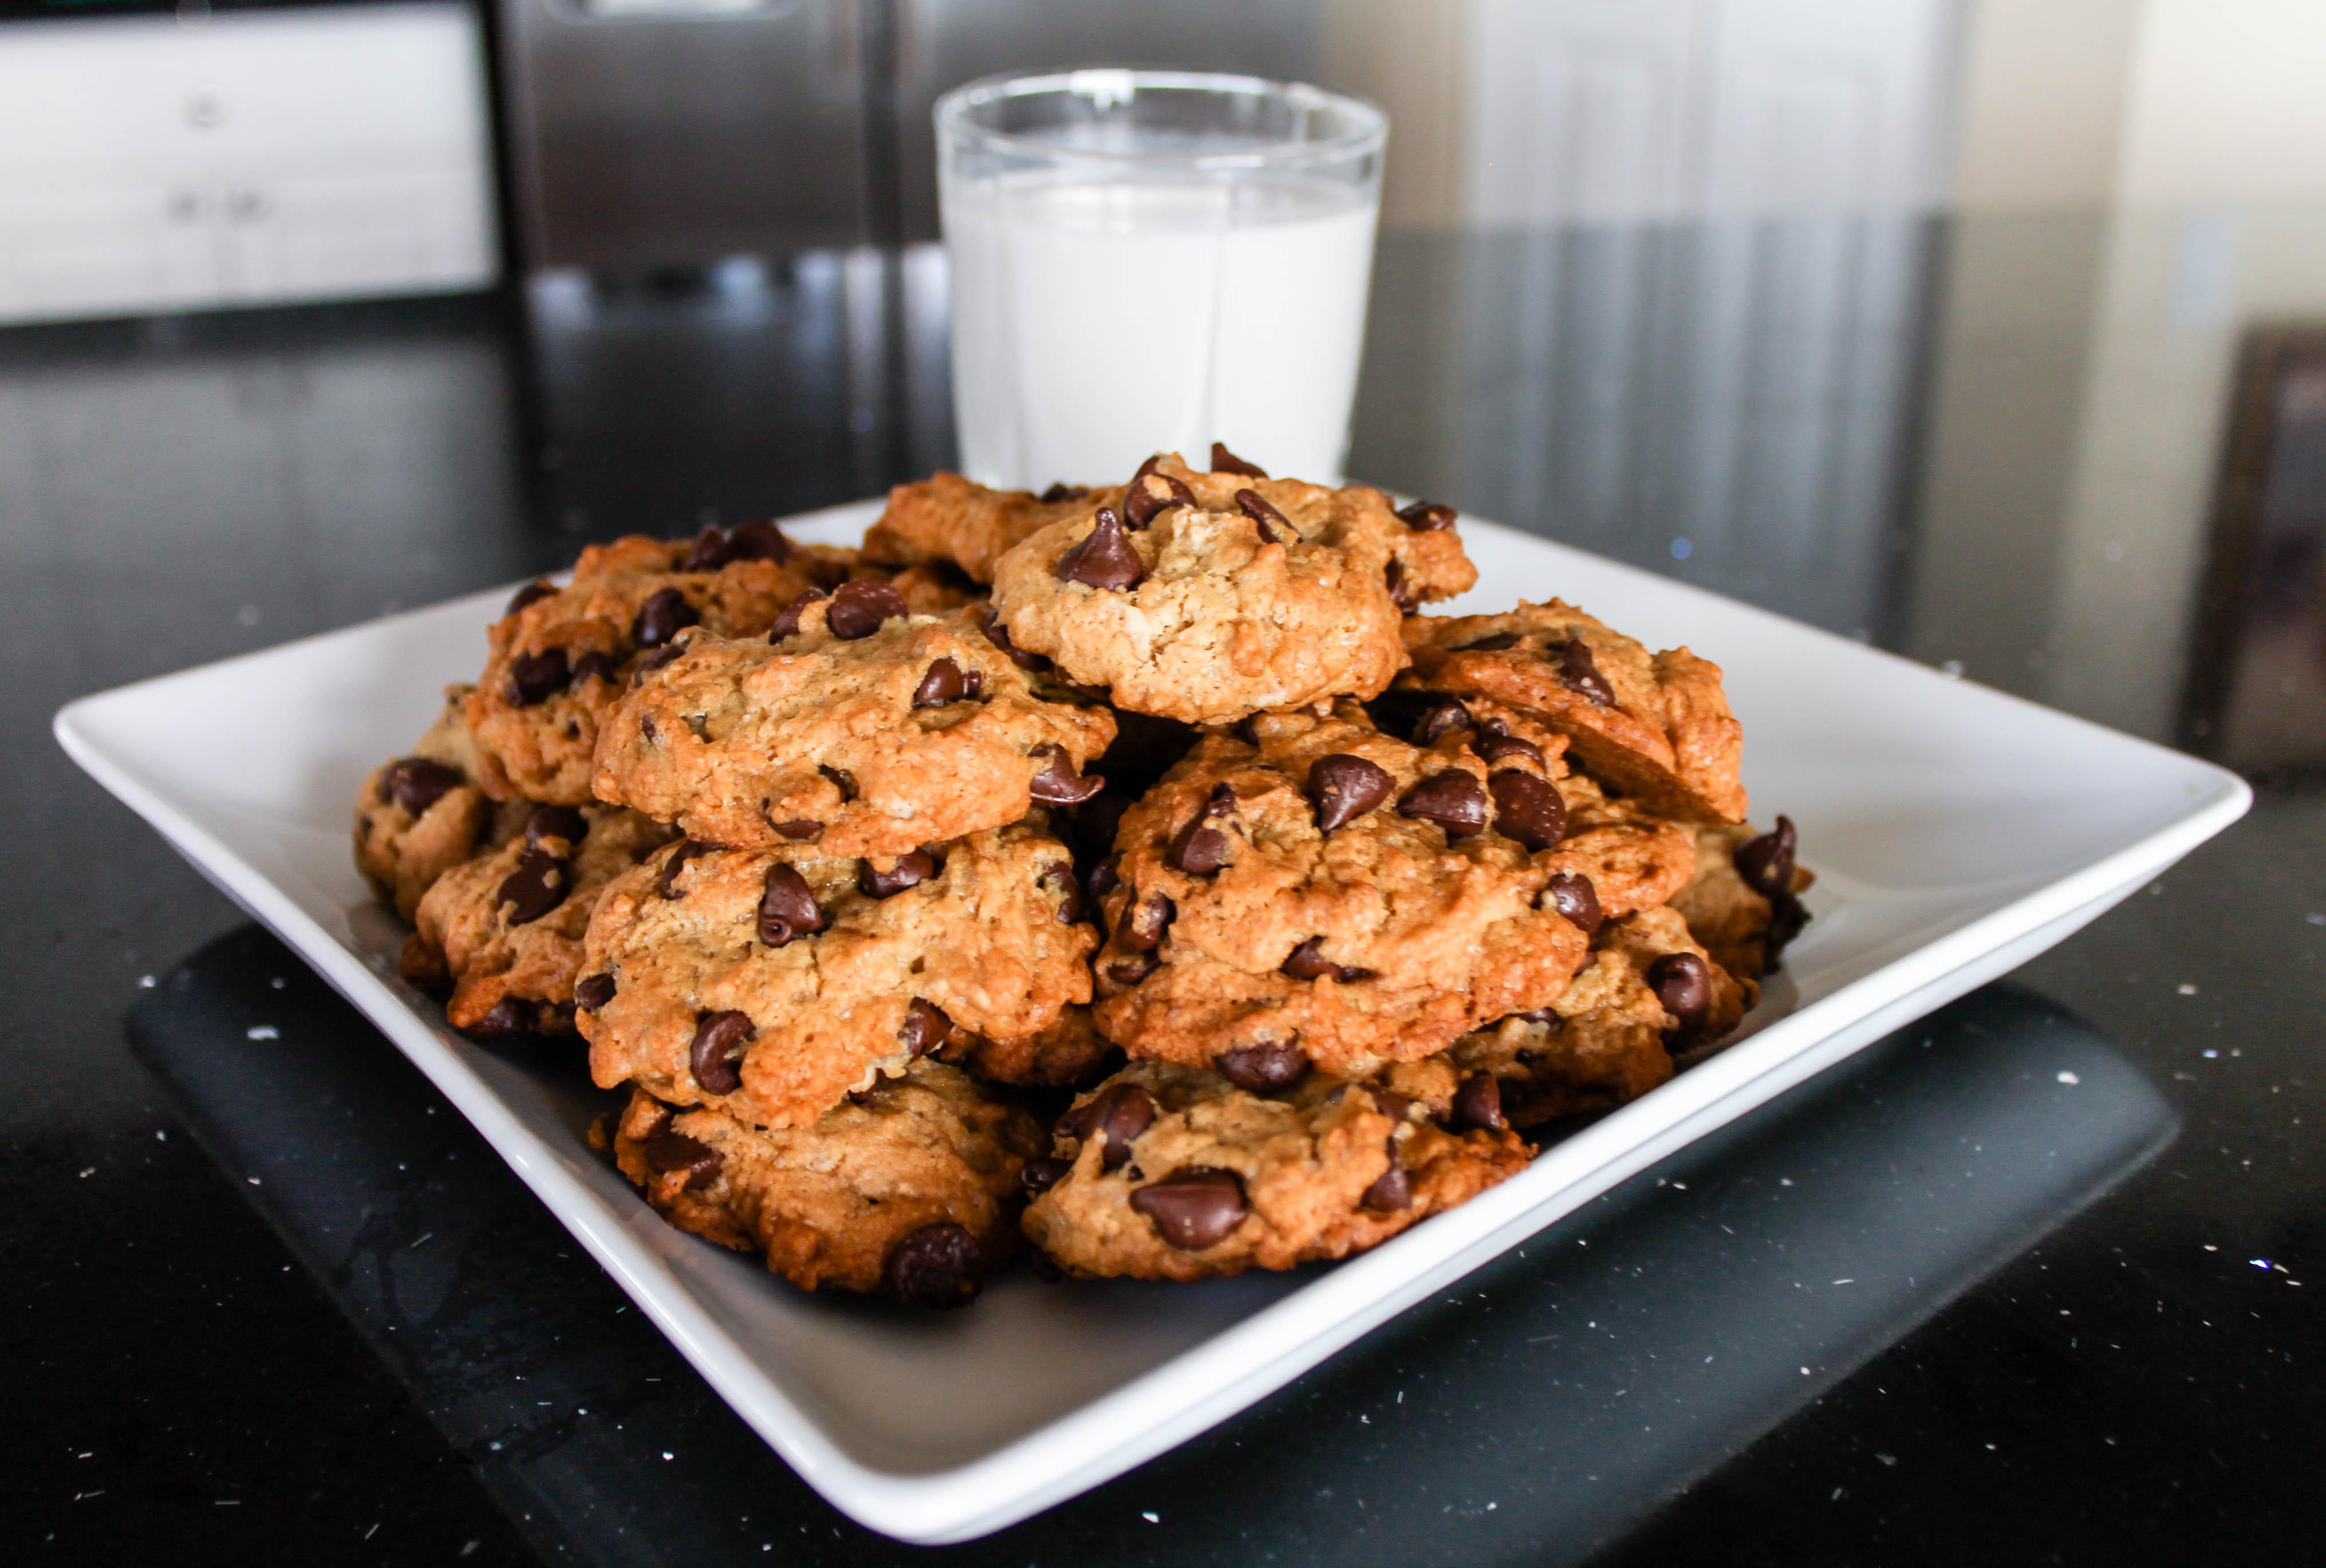 Cookies 1 (1 of 1)